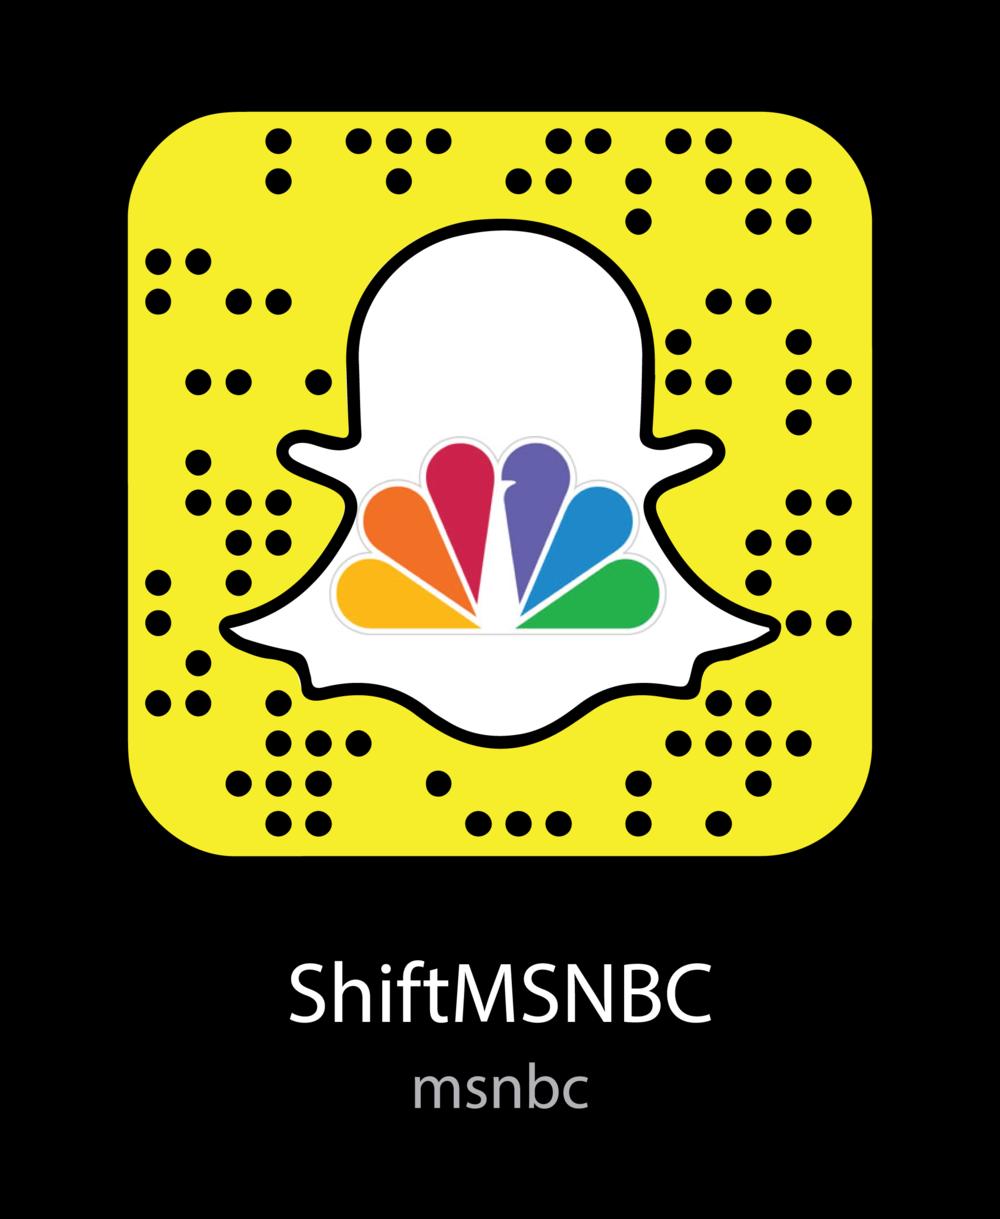 msnbc-Brands-snapchat-snapcode.png